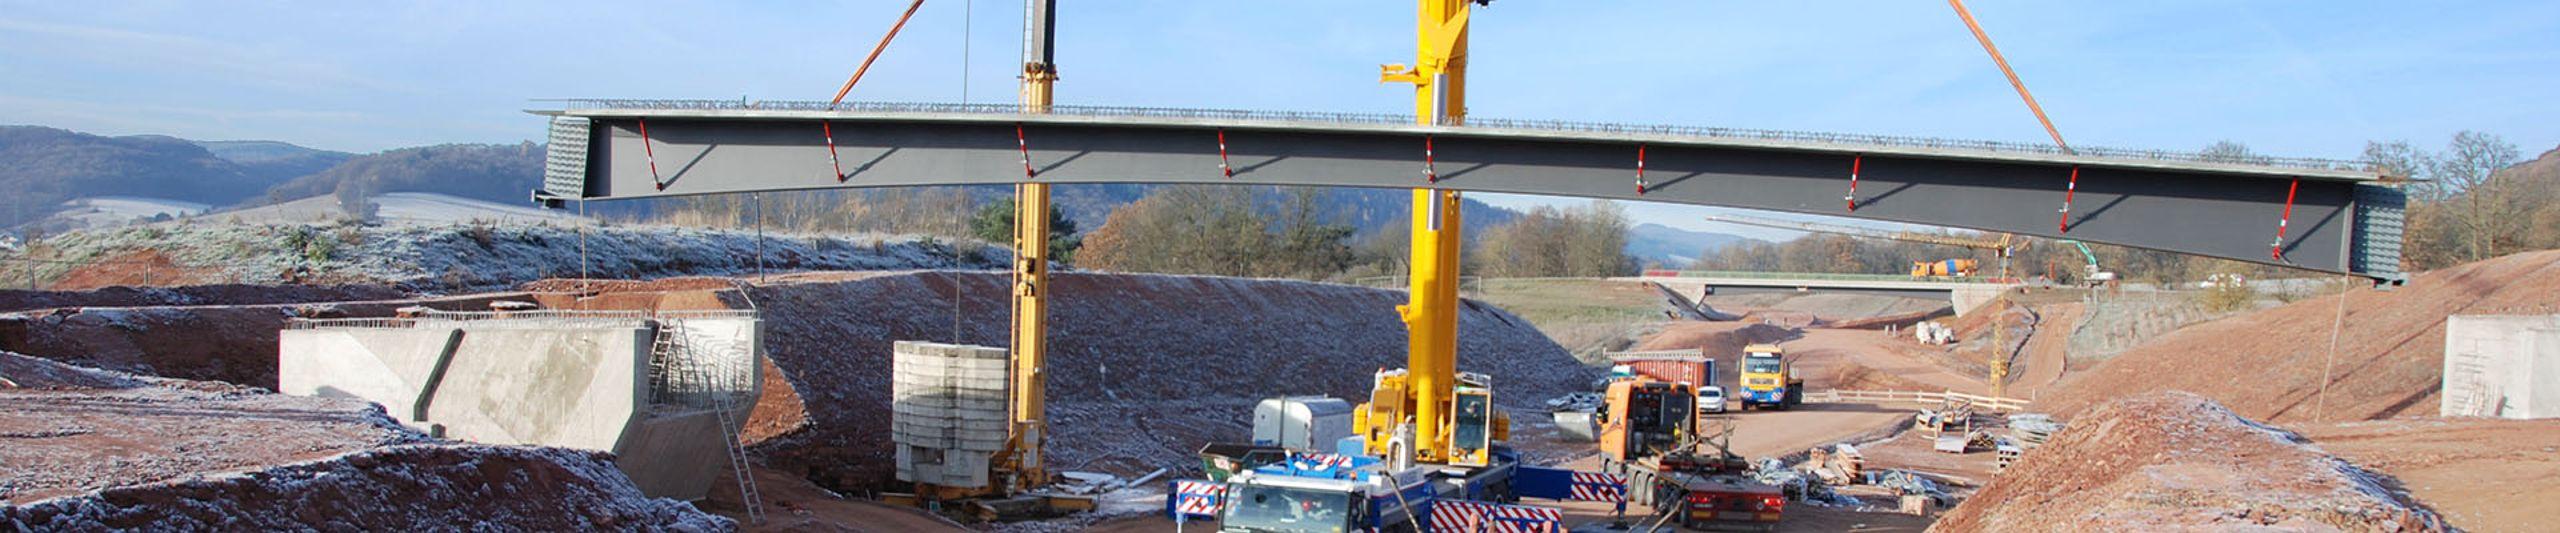 Brückenfertigteile und Brückenträger aus Beton